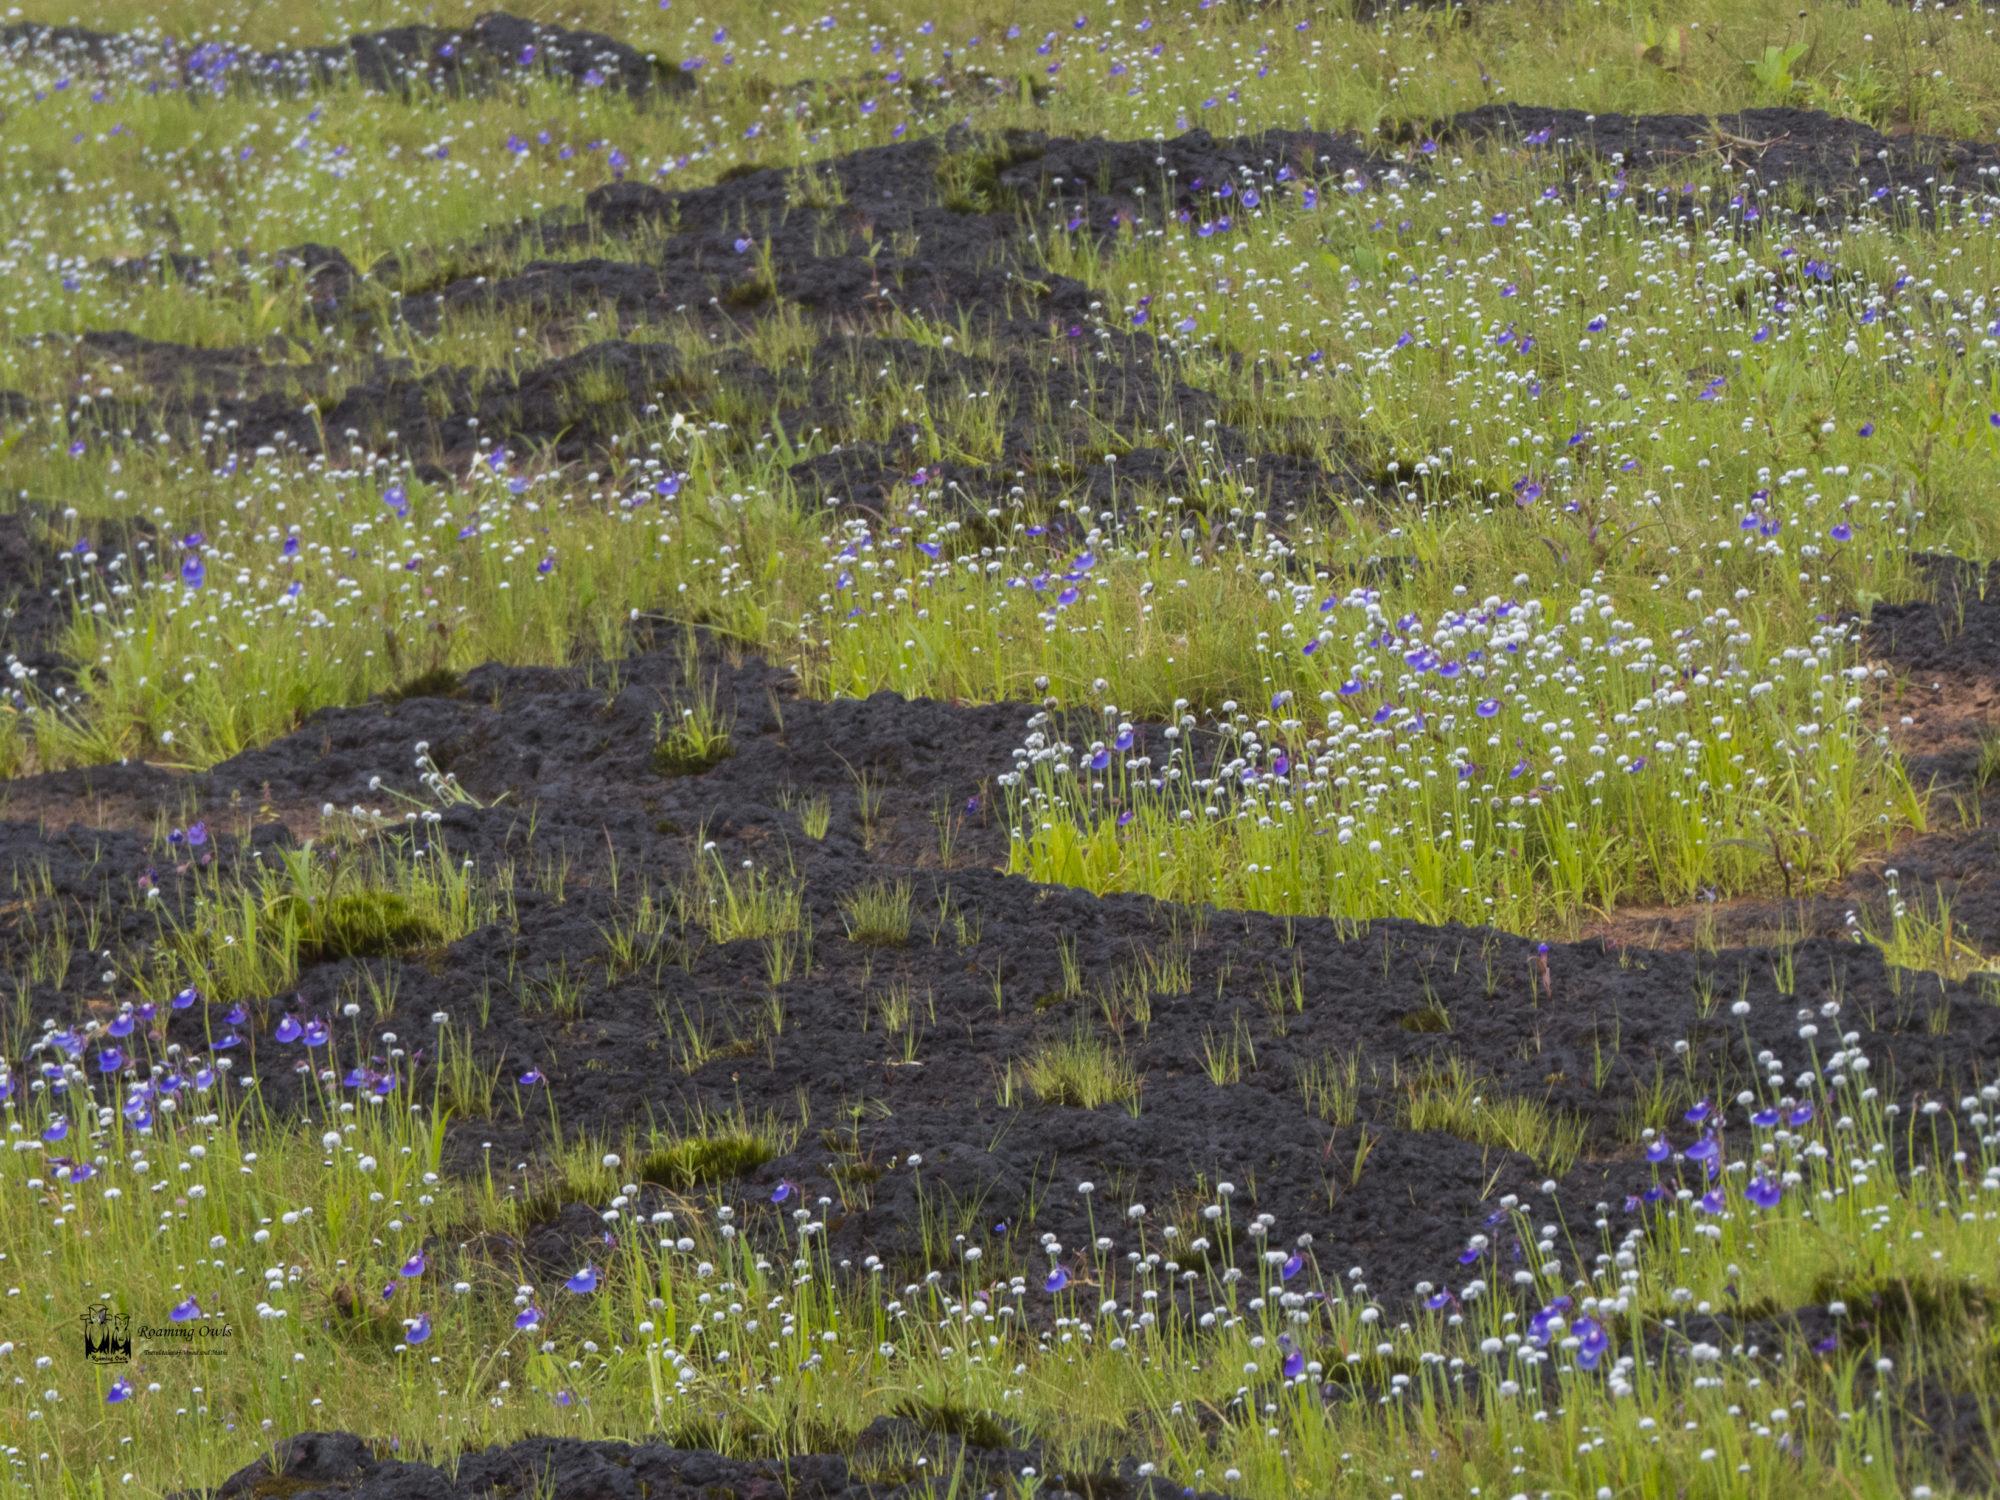 Utricularia arcuata, Eriocaulon,pipewort,kaas